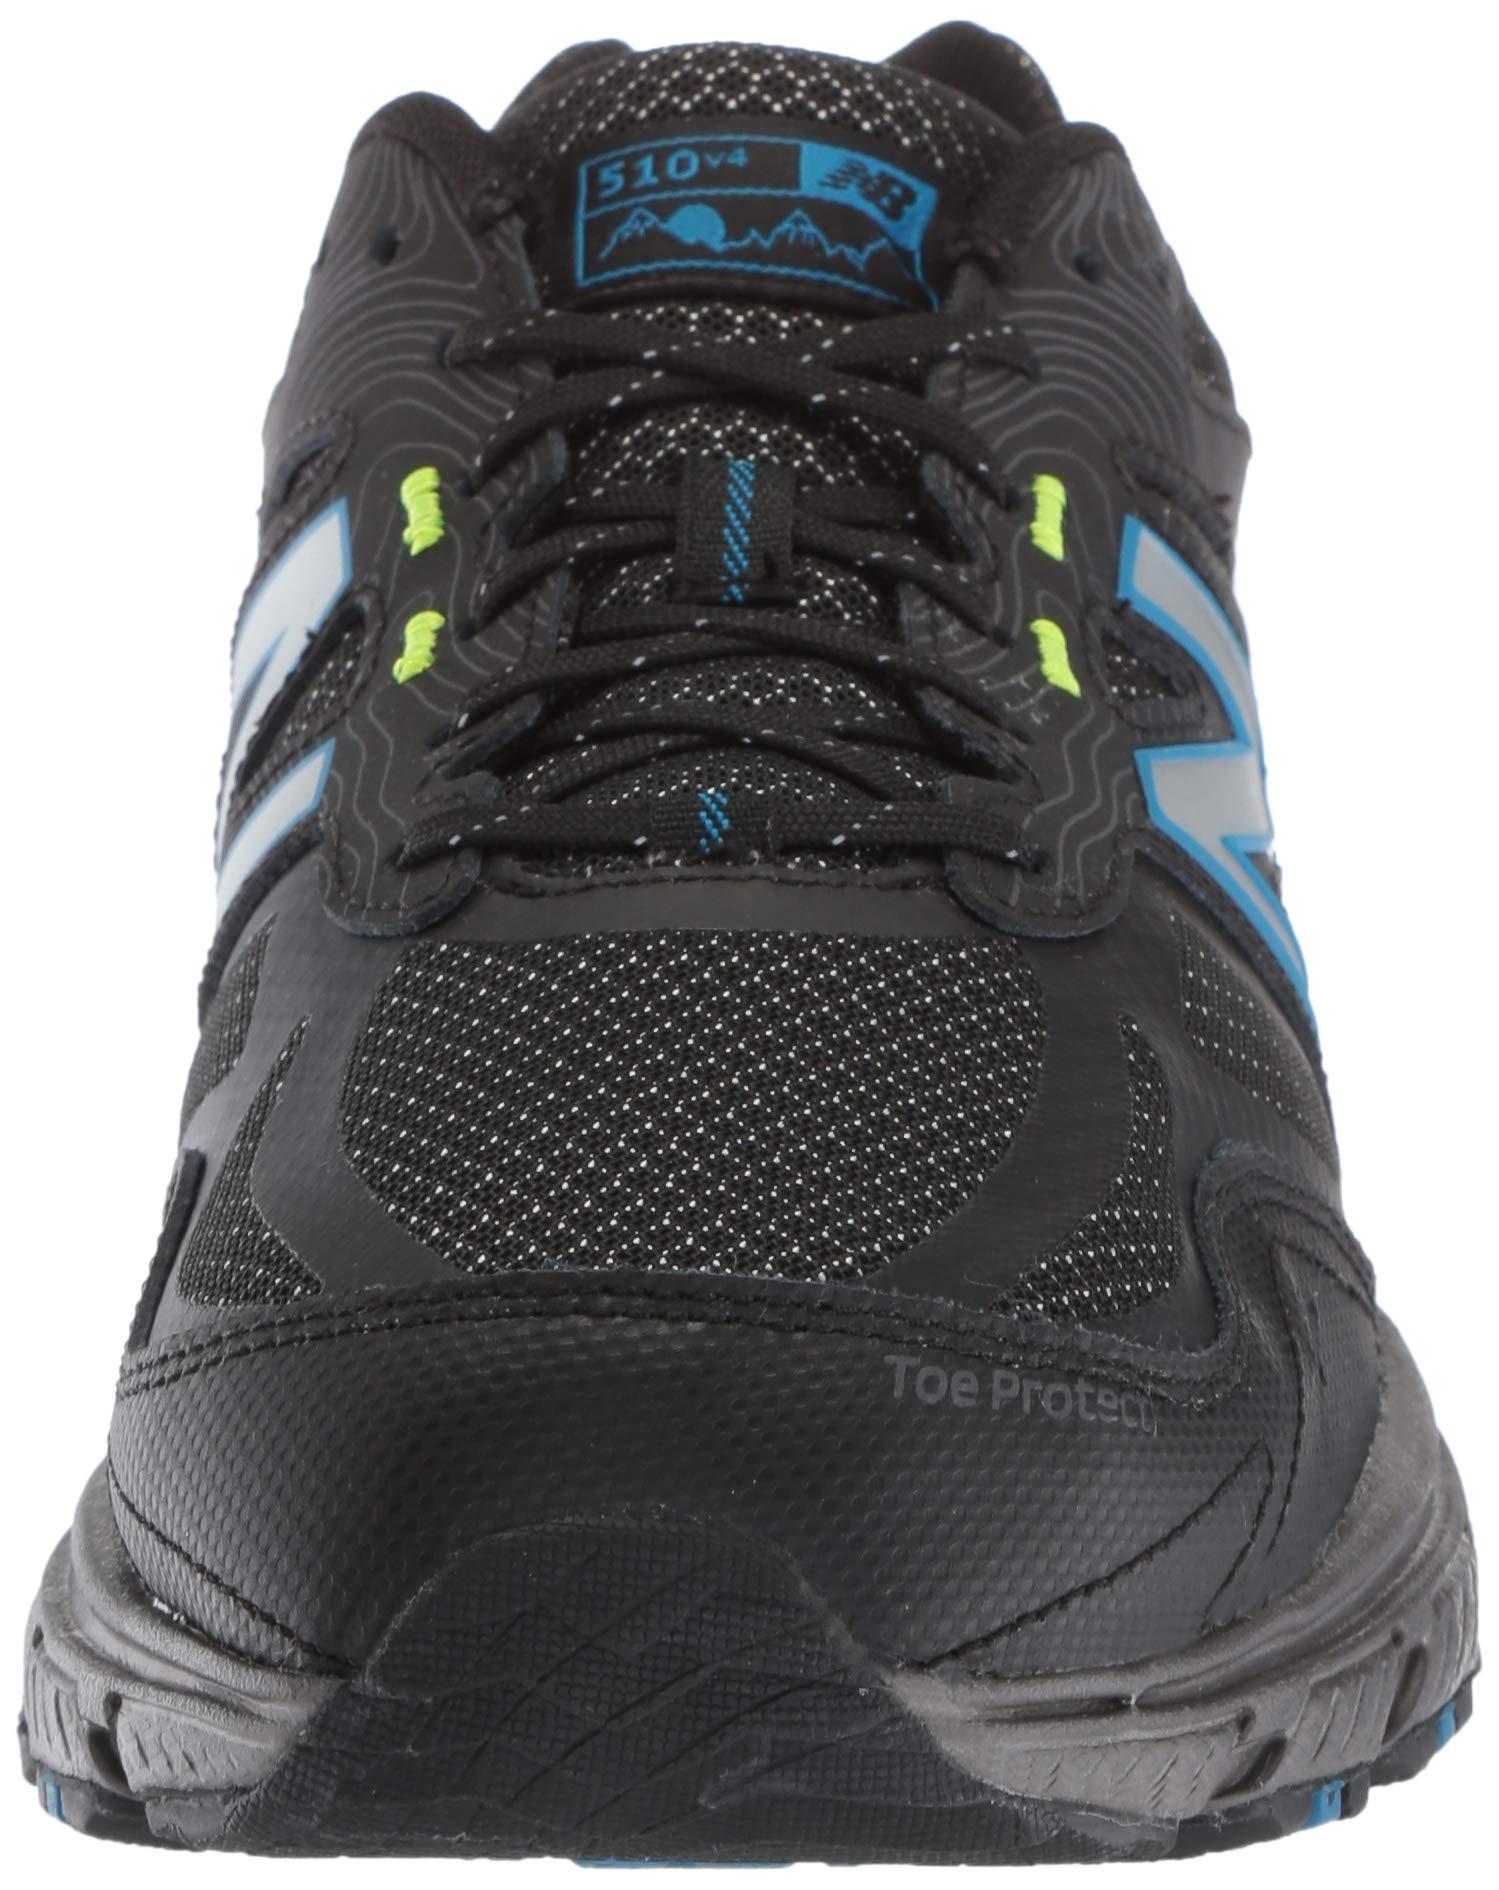 New Balance Men's 510v4 Cushioning Trail Running Shoe, Magnet/Black/Reflective, 7.5 D US by New Balance (Image #4)